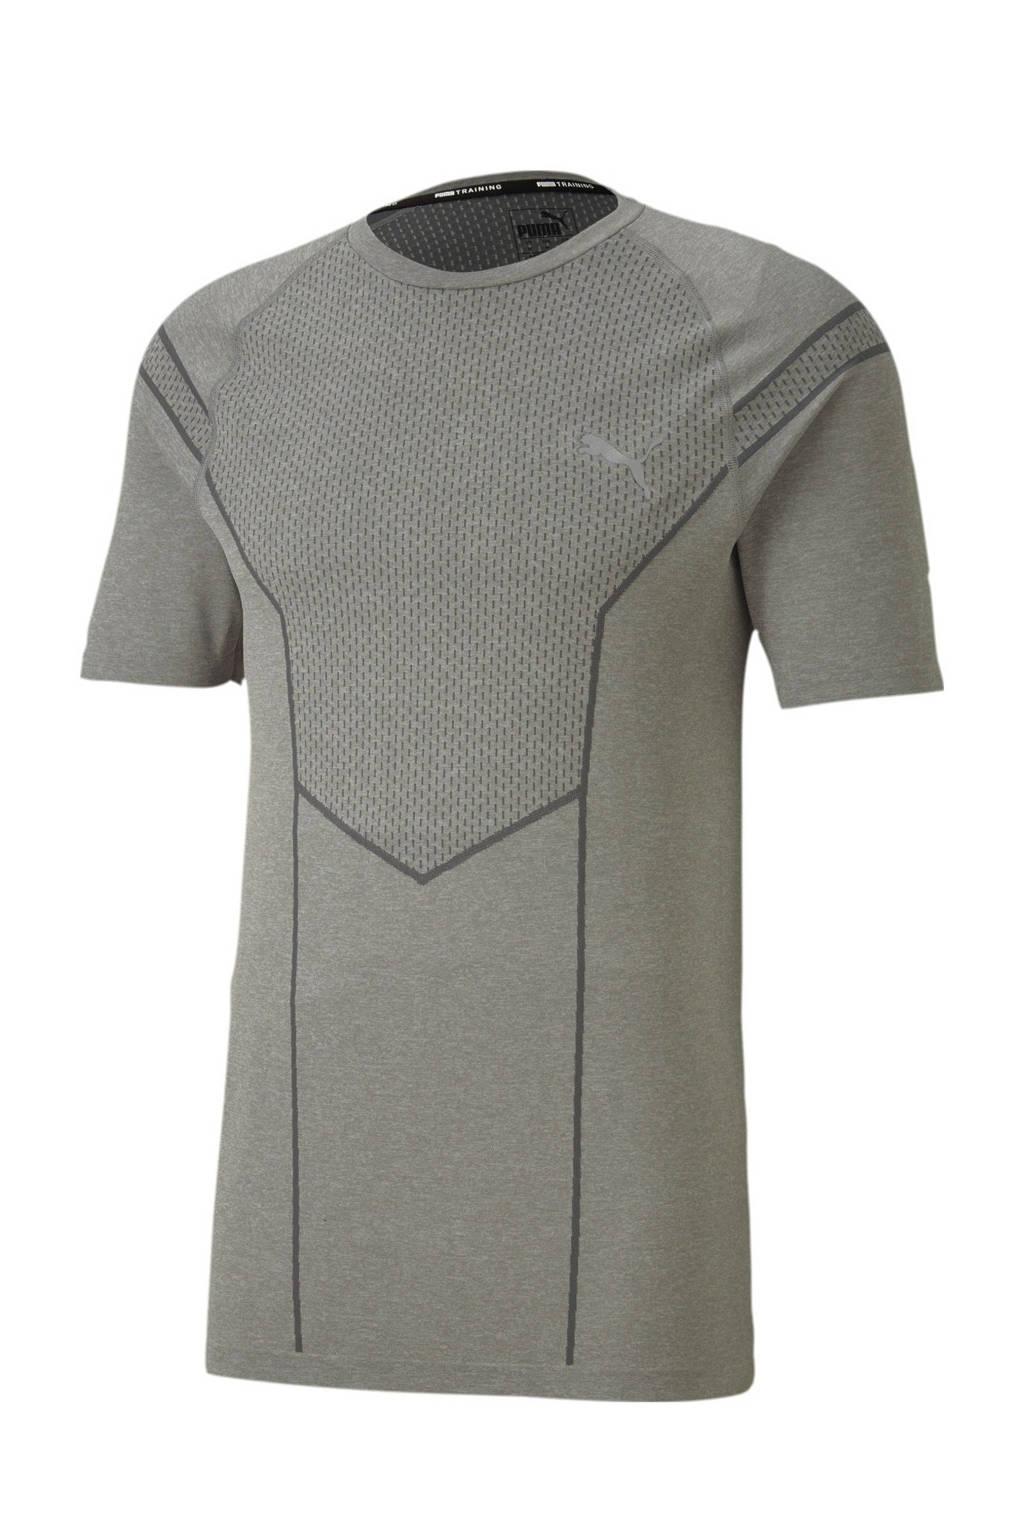 Puma   sport T-shirt grijs melange, Grijs melange